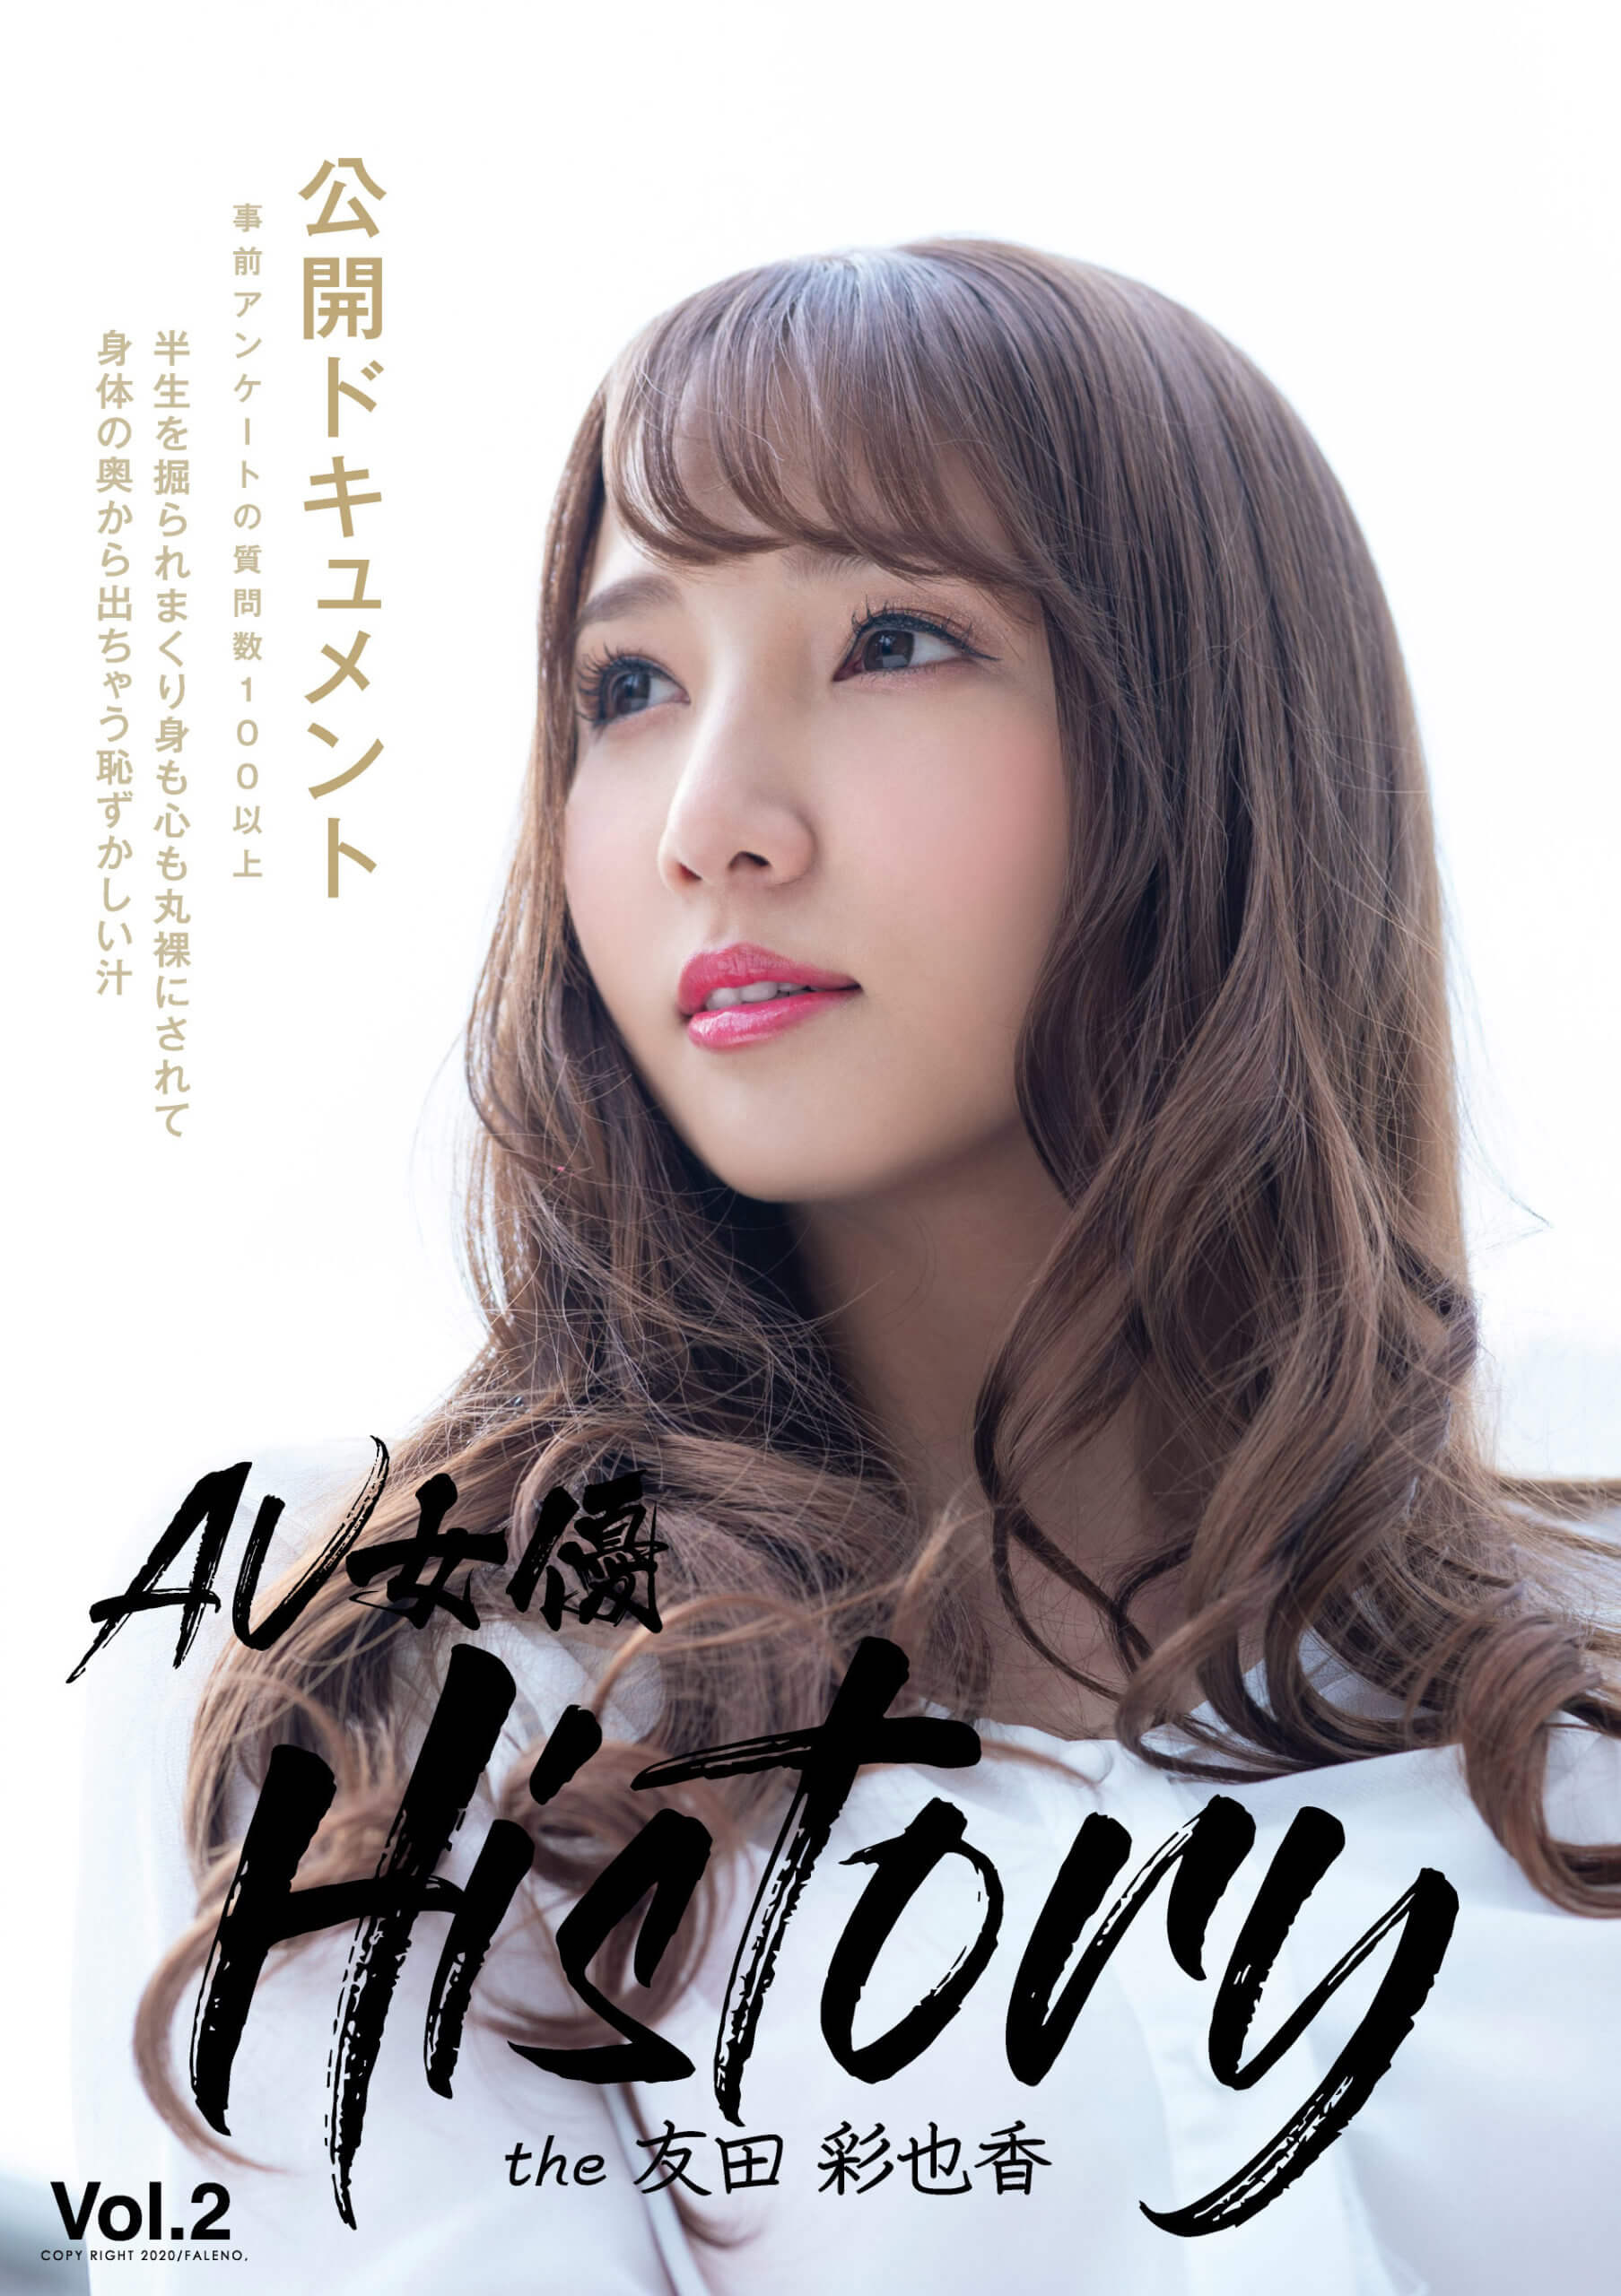 AV女優History the友田彩也香Vol.2